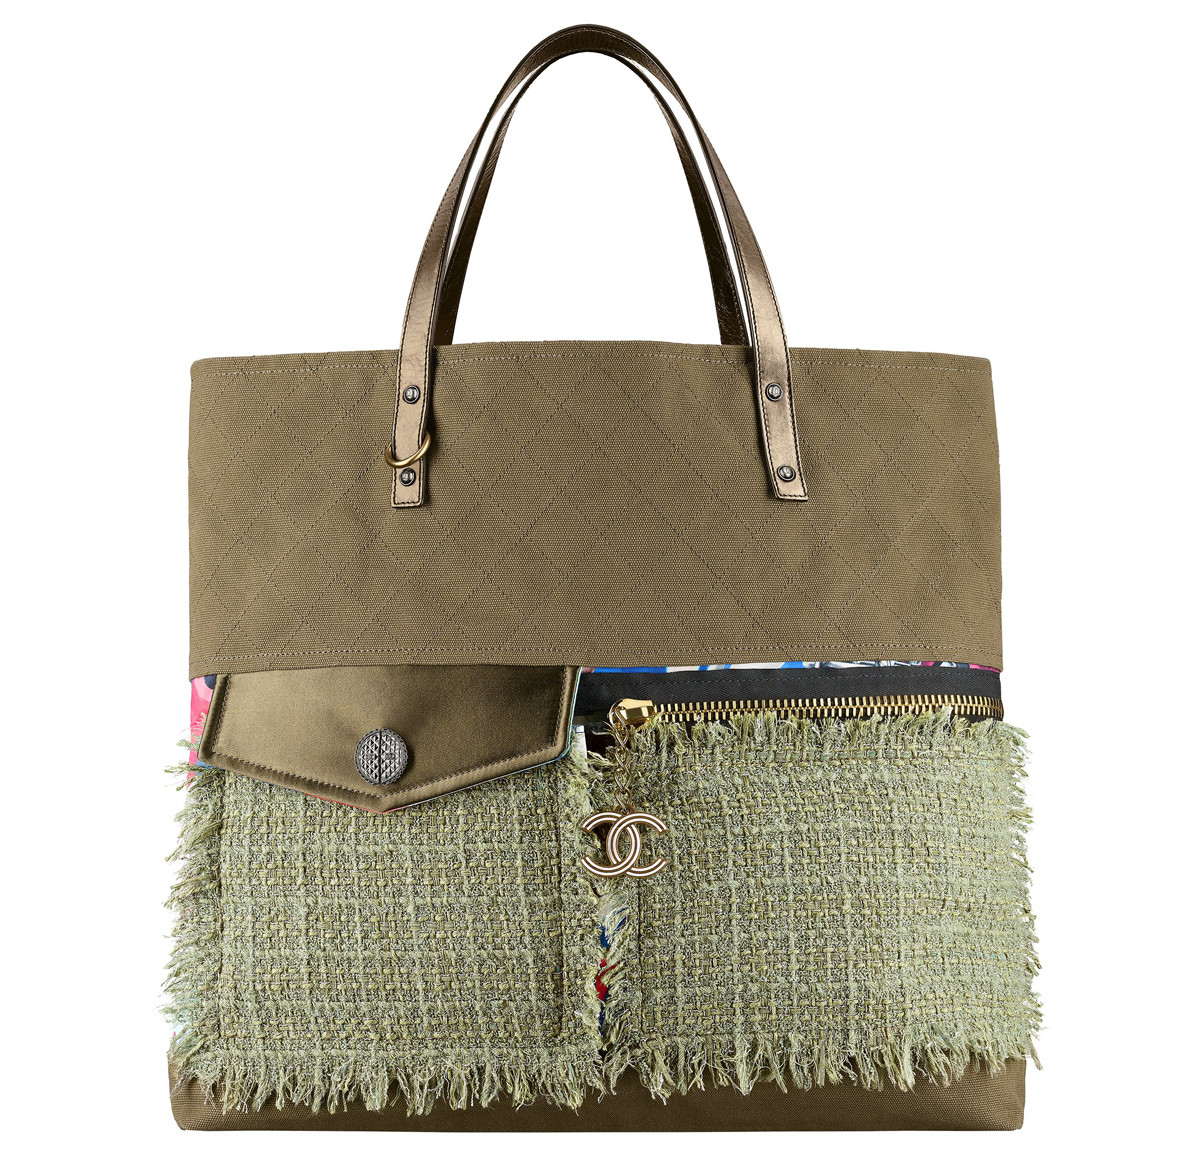 Chanel Cuba Khaki toile and tweed shopping bag